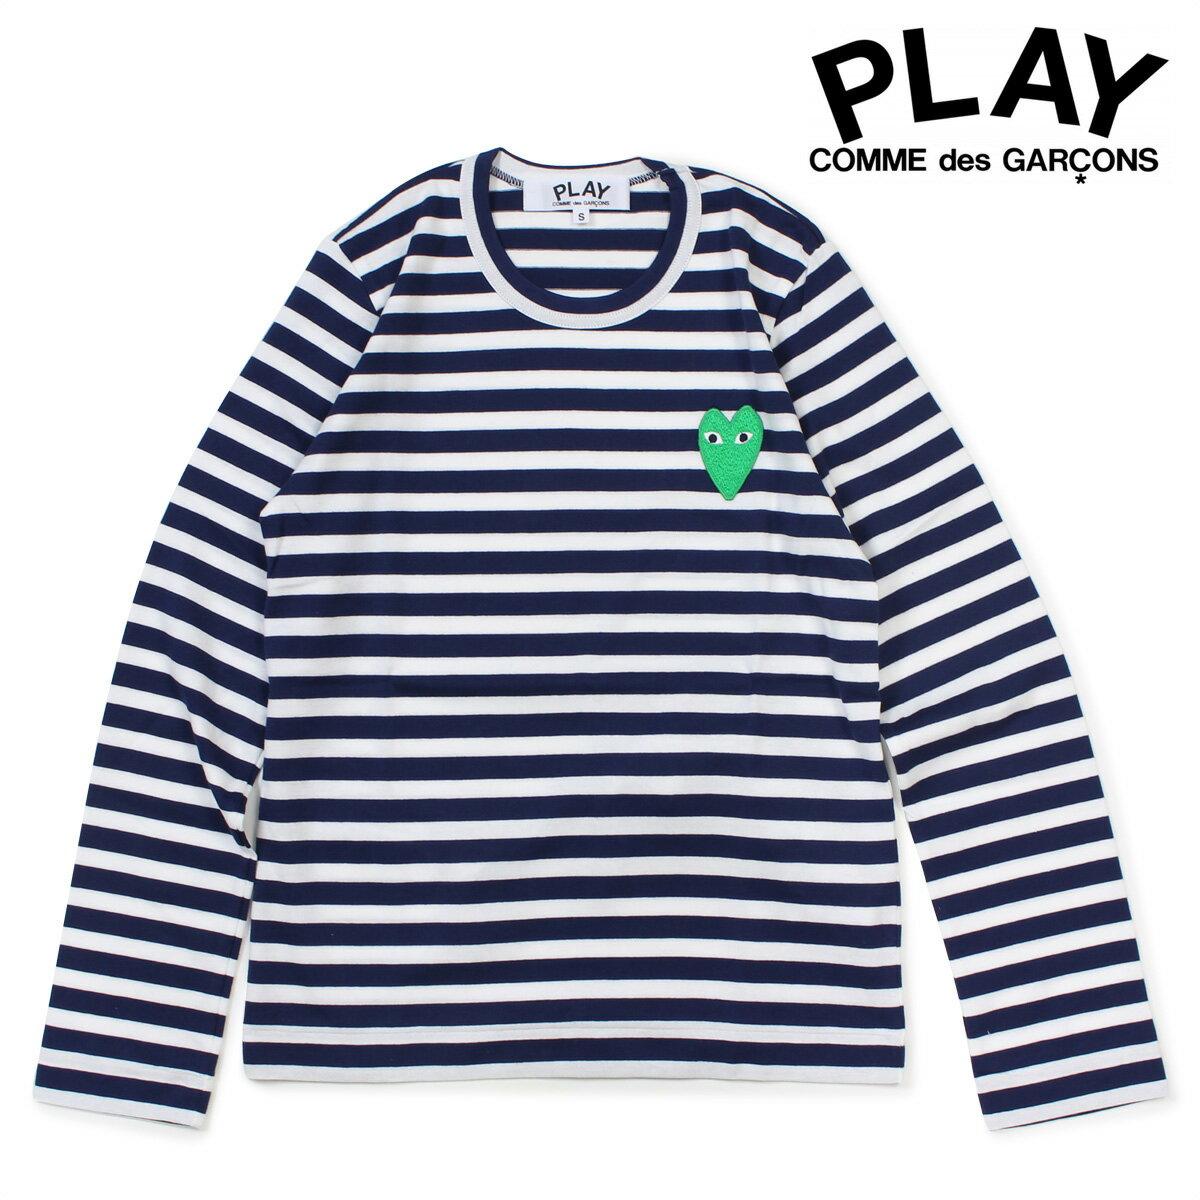 COMME des GARCONS PLAY HEART LS T-SHIRT コムデギャルソン レディース Tシャツ 長袖 ボーダー カットソー AZ-T051 ホワイト